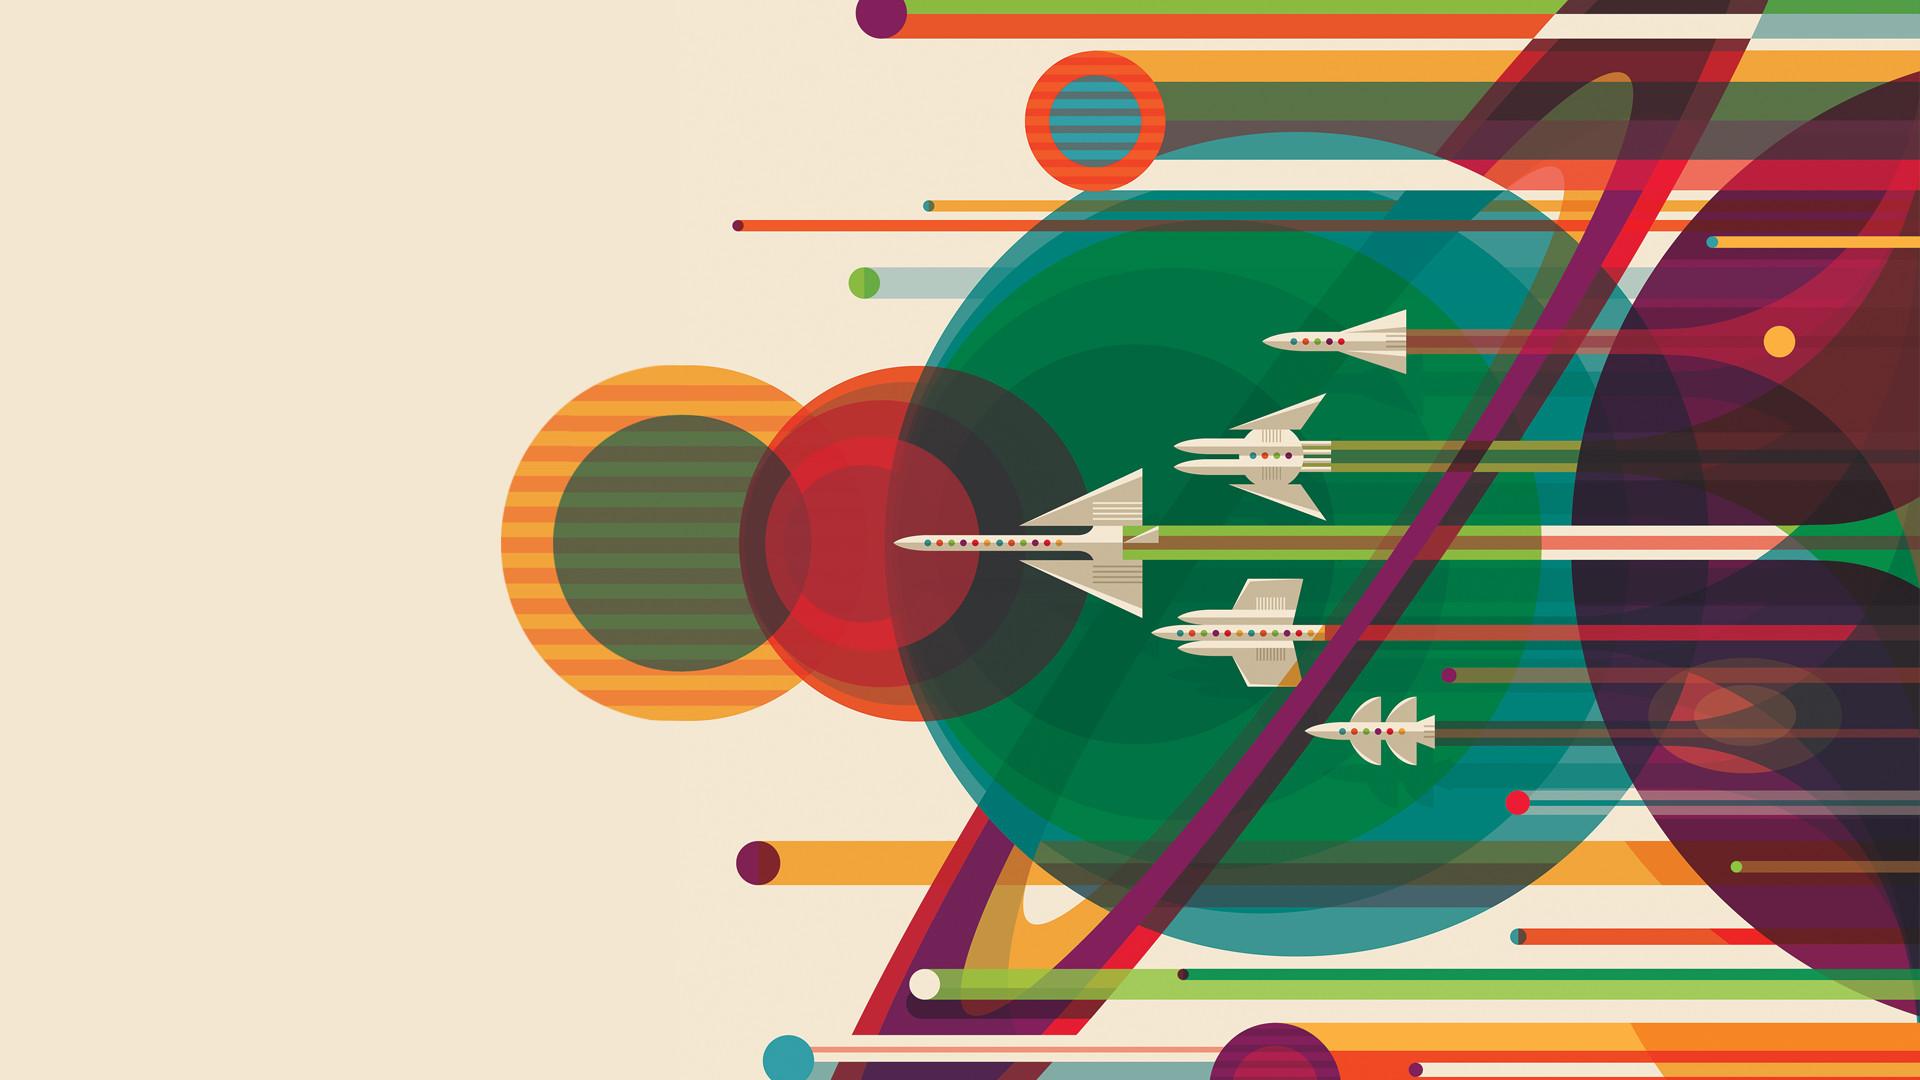 NASA's 'Great Tour' Poster as a Wallpaper!